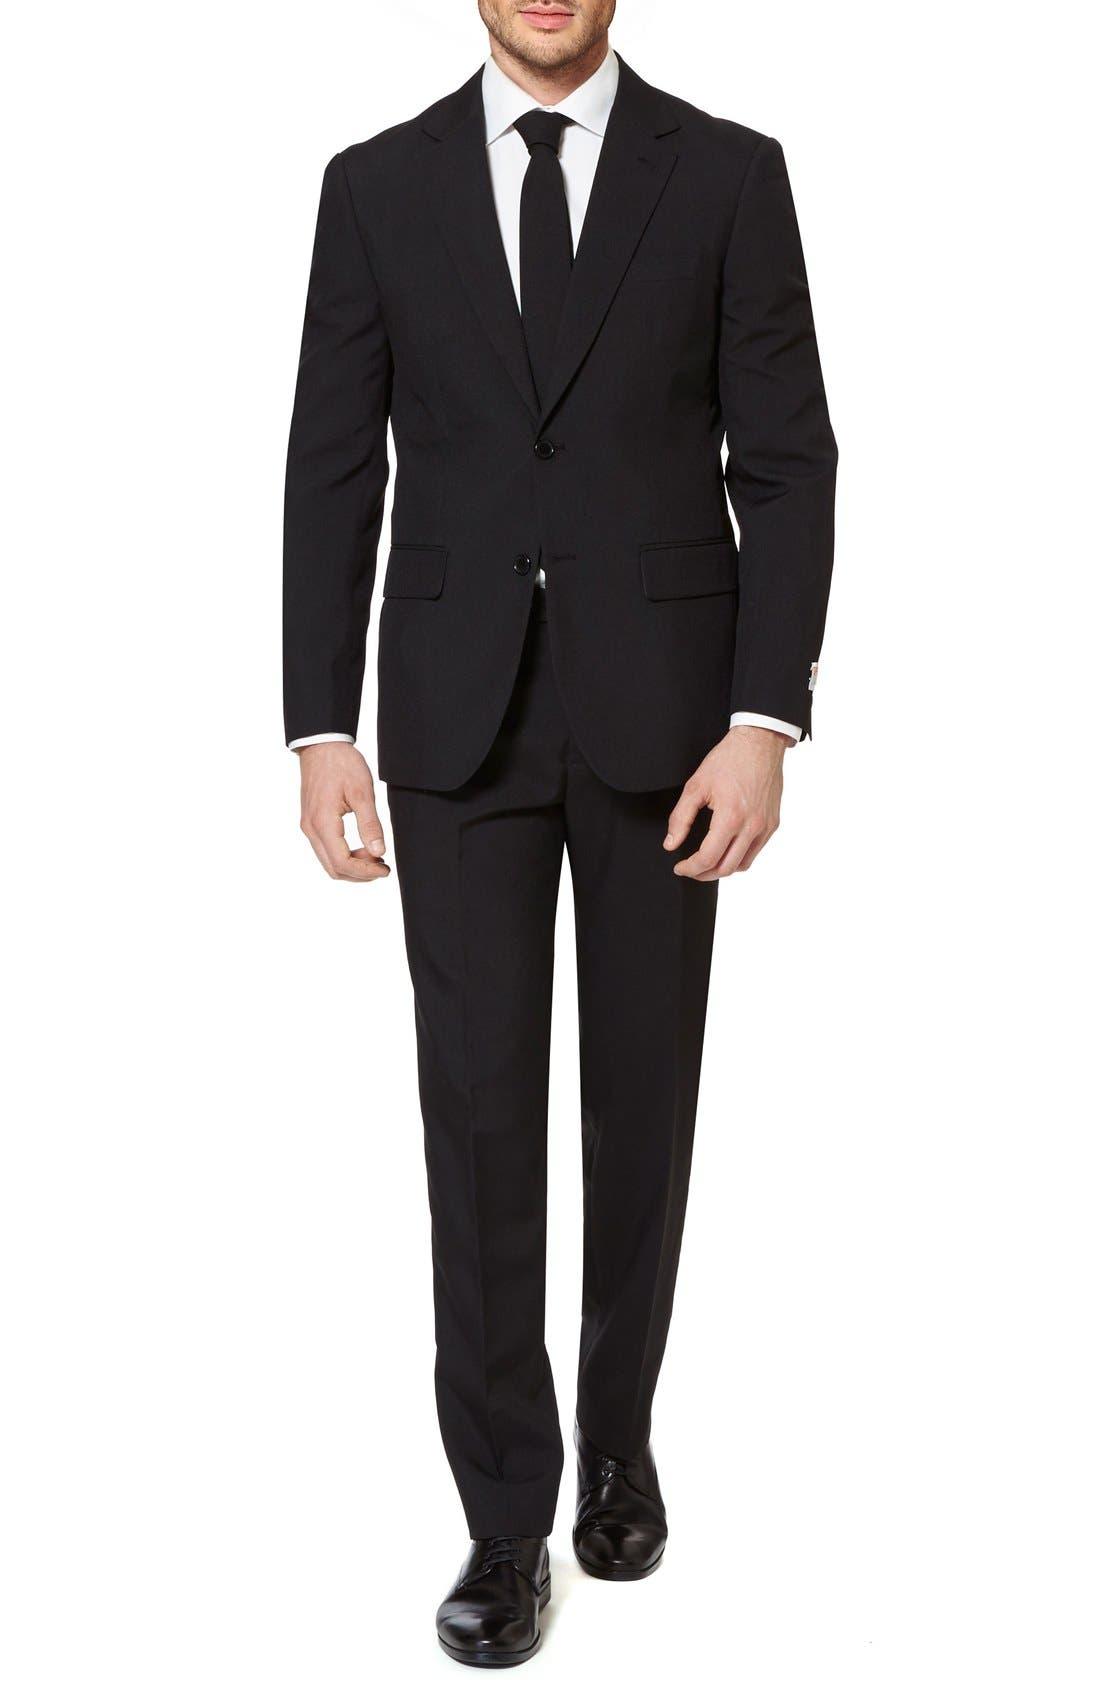 'Black Knight' Trim Fit Two-Piece Suit with Tie,                             Alternate thumbnail 4, color,                             001